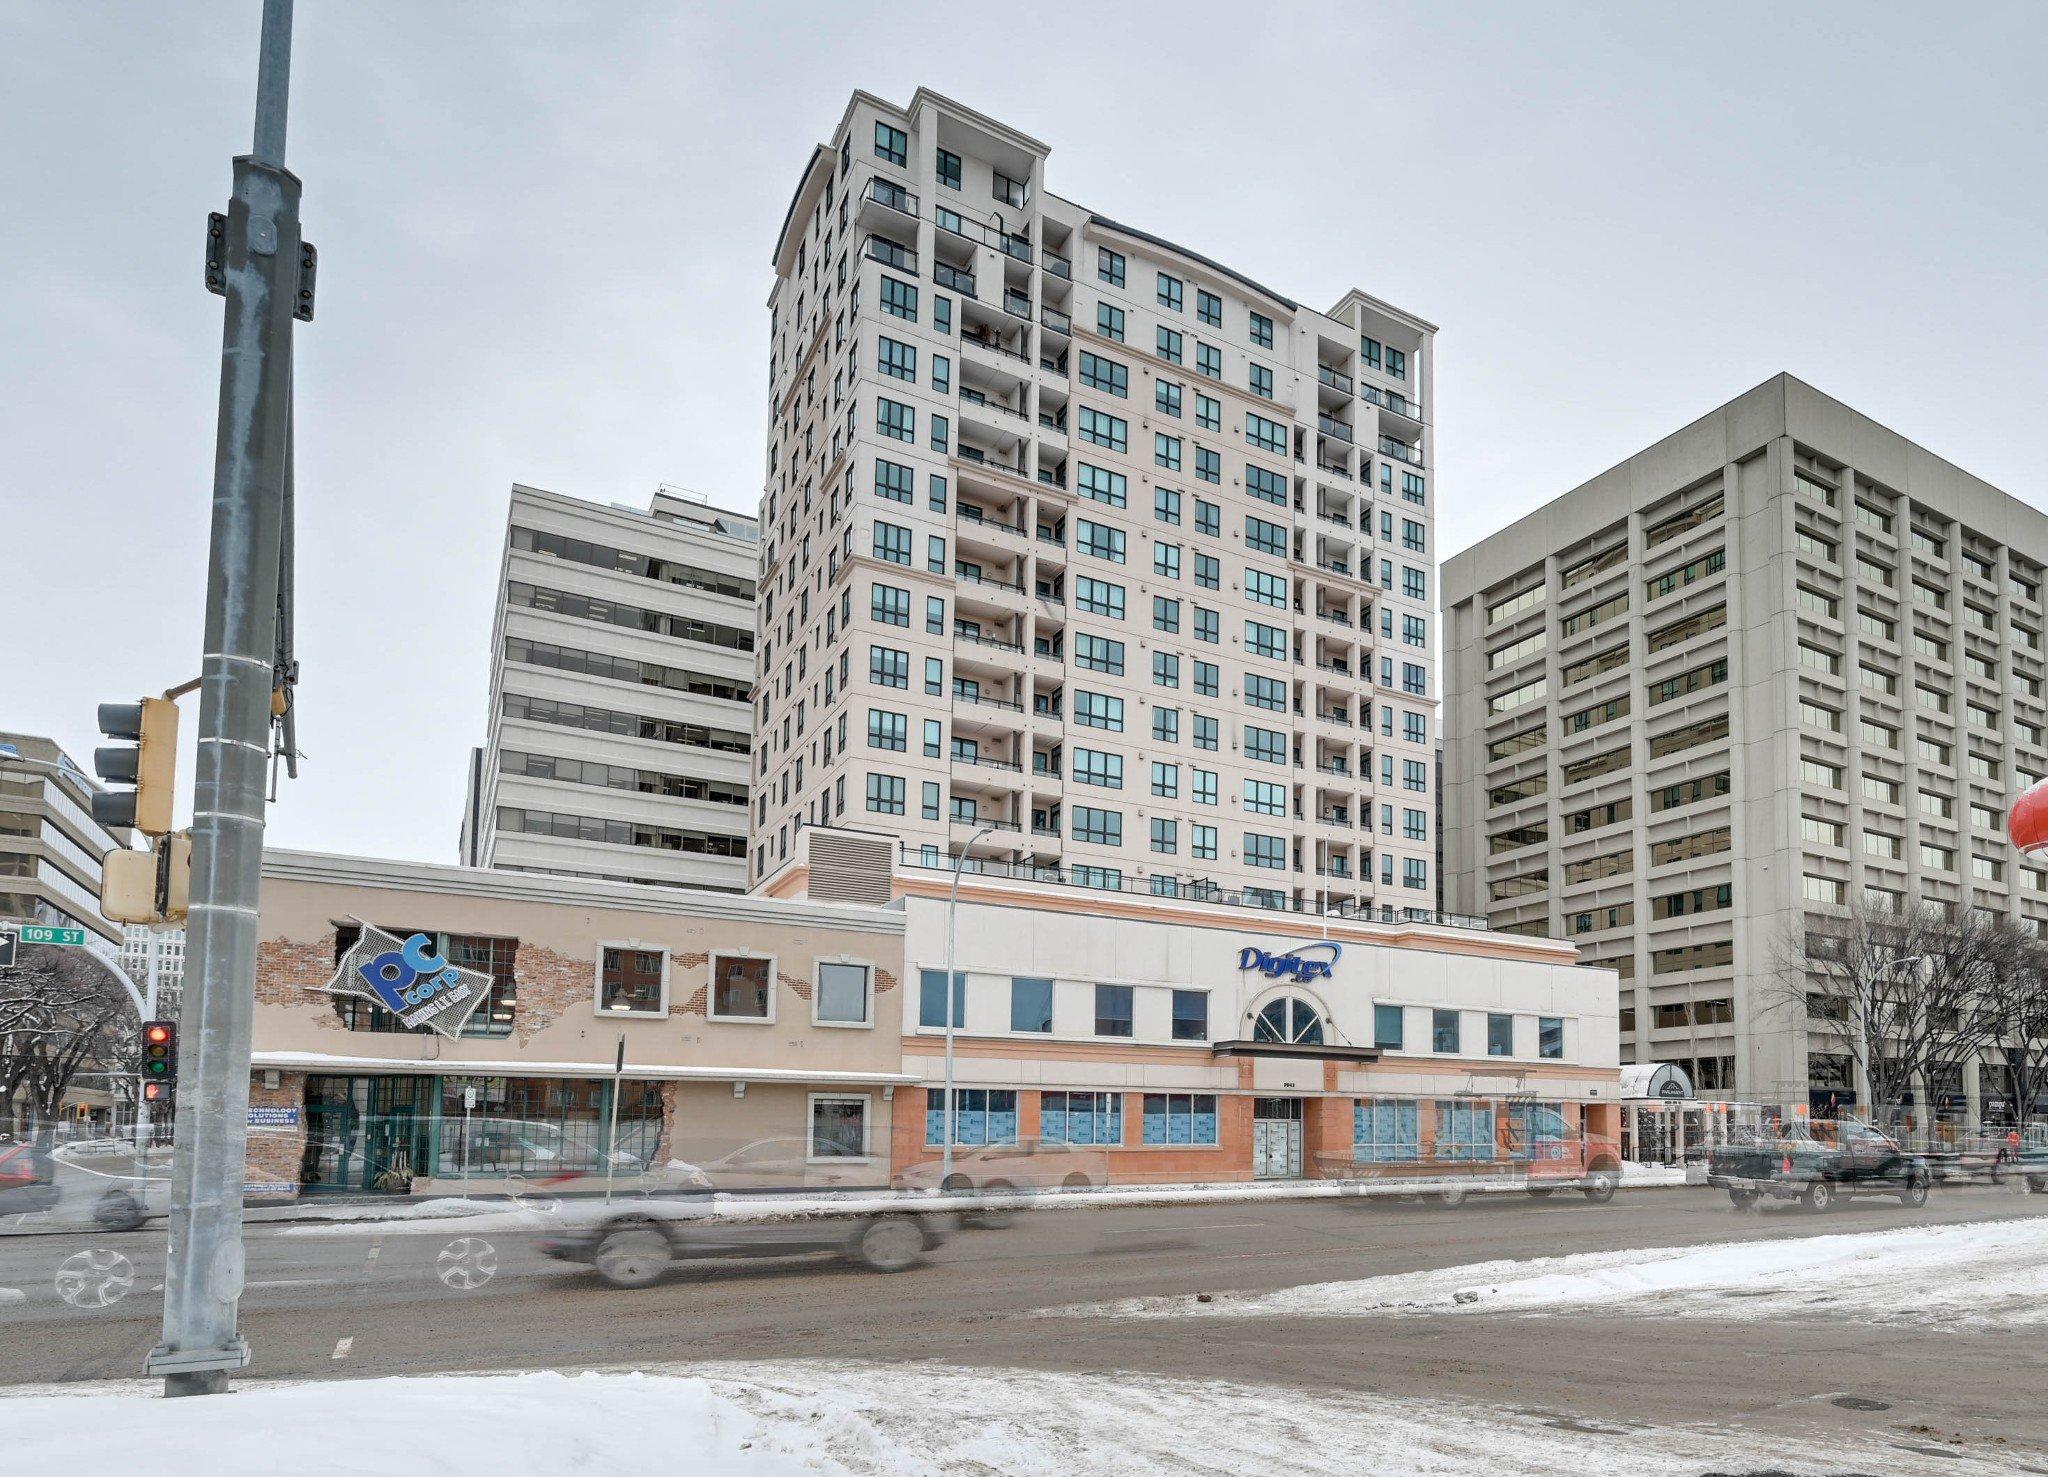 Main Photo: #1205, 9939 109St in Edmonton: Downtown Condo for sale : MLS®# E4187756